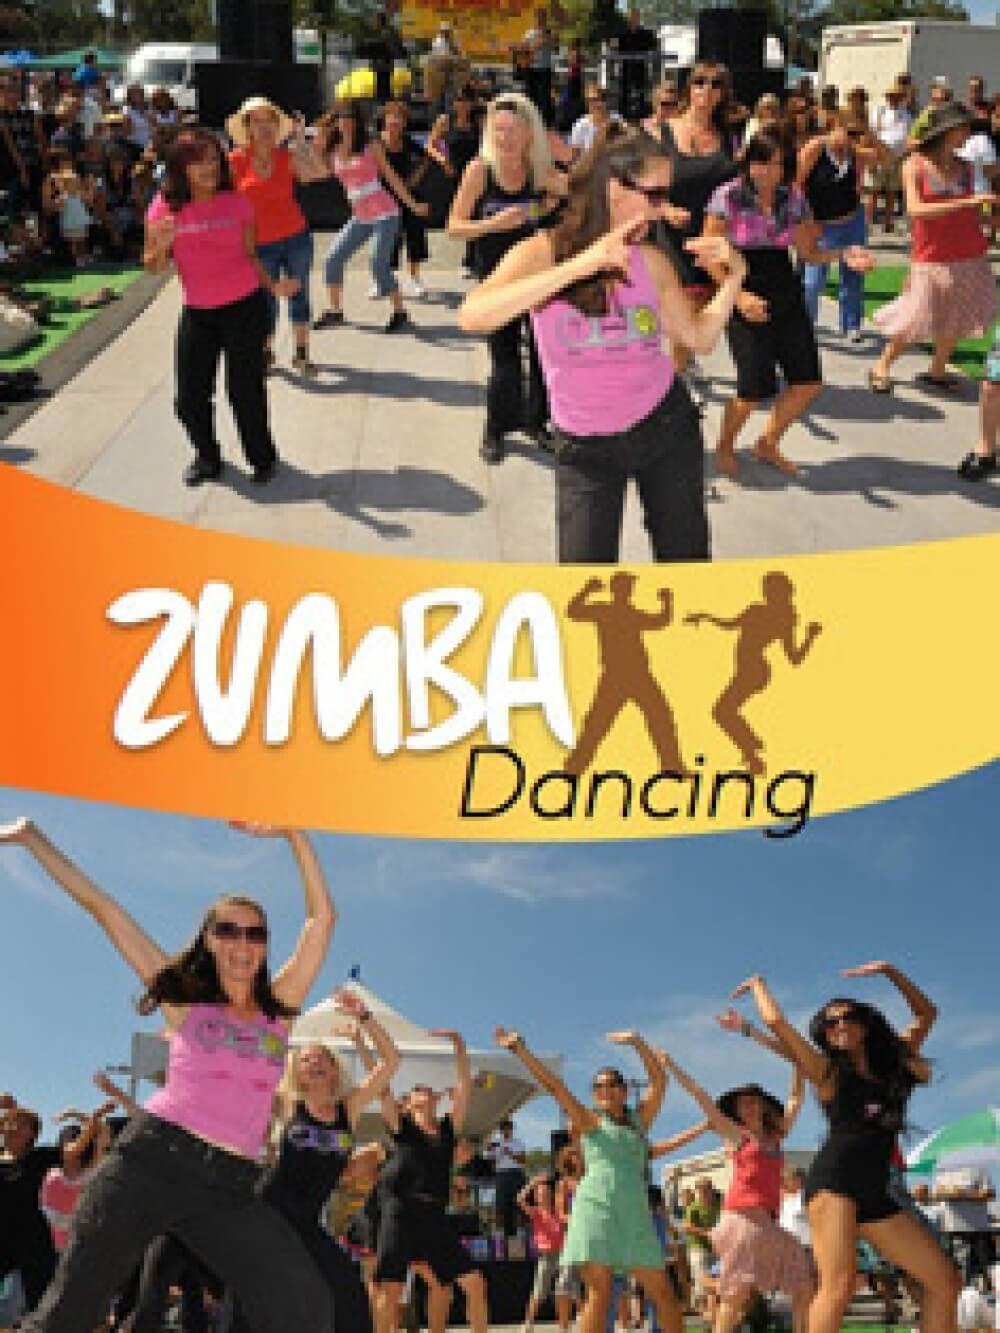 zumba_dancing_vertical_web